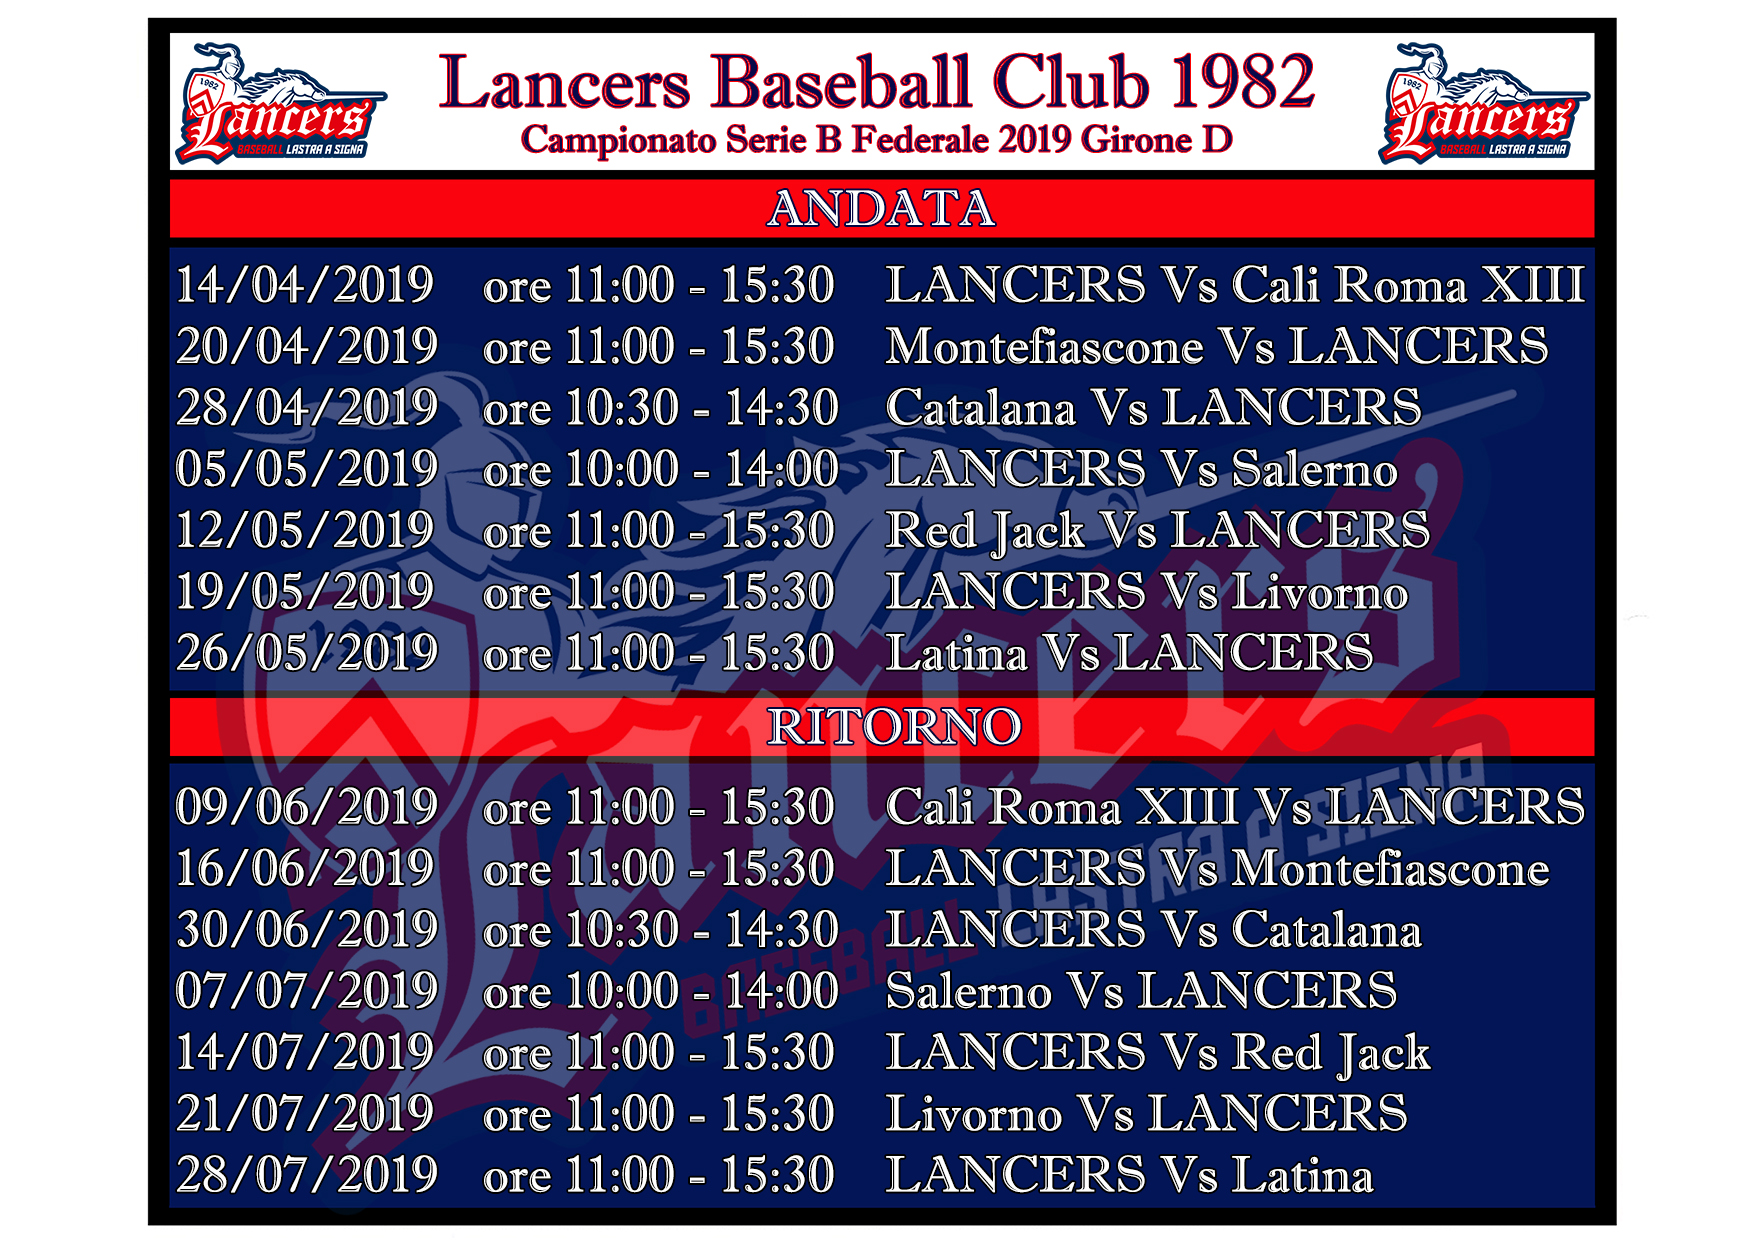 Risultati Calendario Serie A.Calendario Serie B Lancers Baseball Club 1982